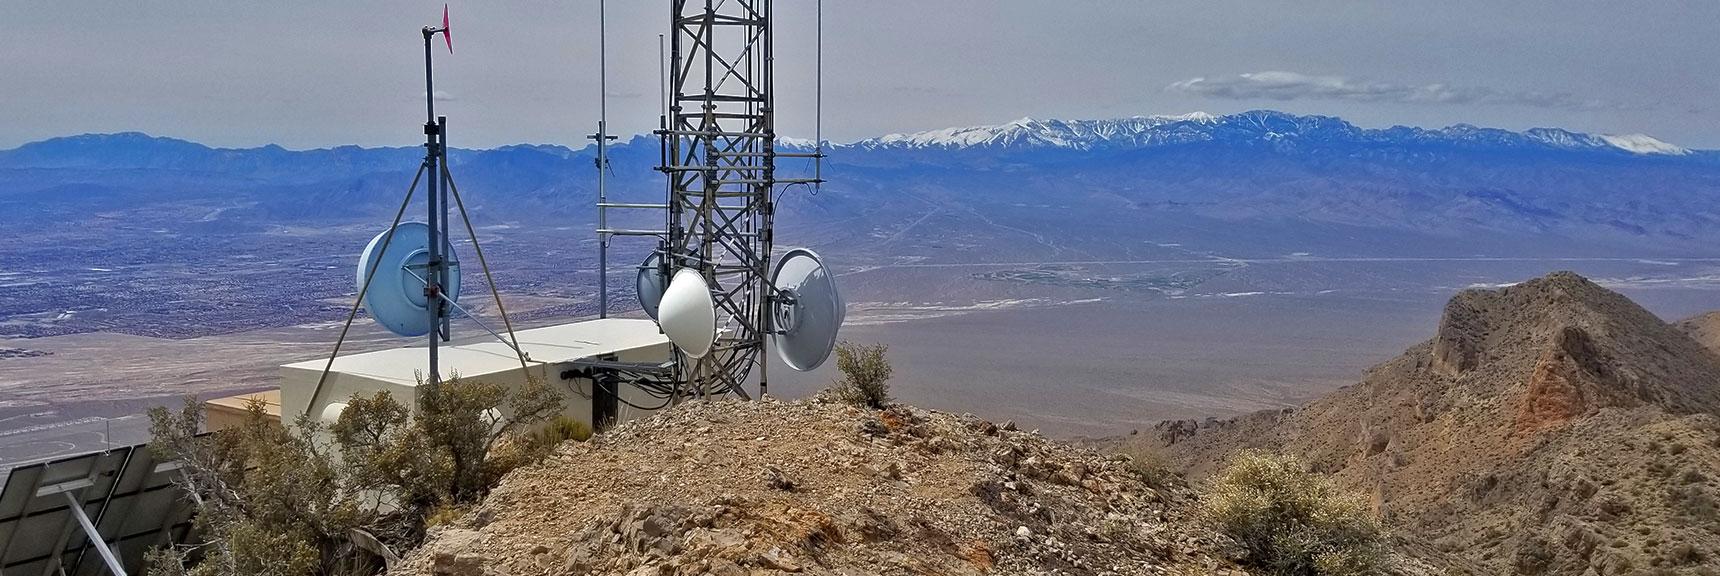 View West From Gass Peak Eastern Summit | Gass Peak Eastern Summit Ultra-marathon Adventure, Nevada